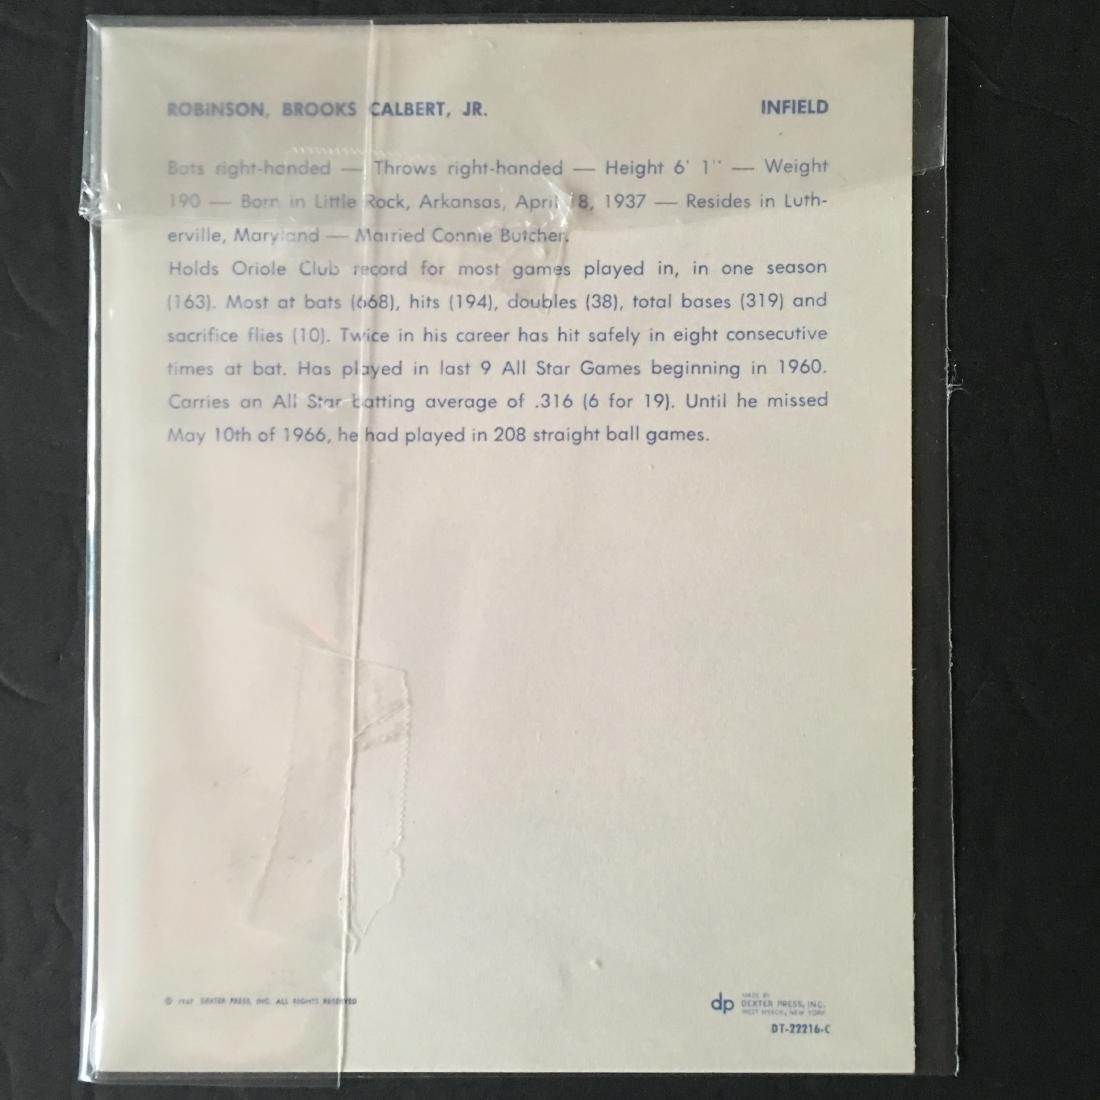 VINTAGE 1967 DEXTER PRESS BROOKS ROBINSON PHOTO CARD - 2